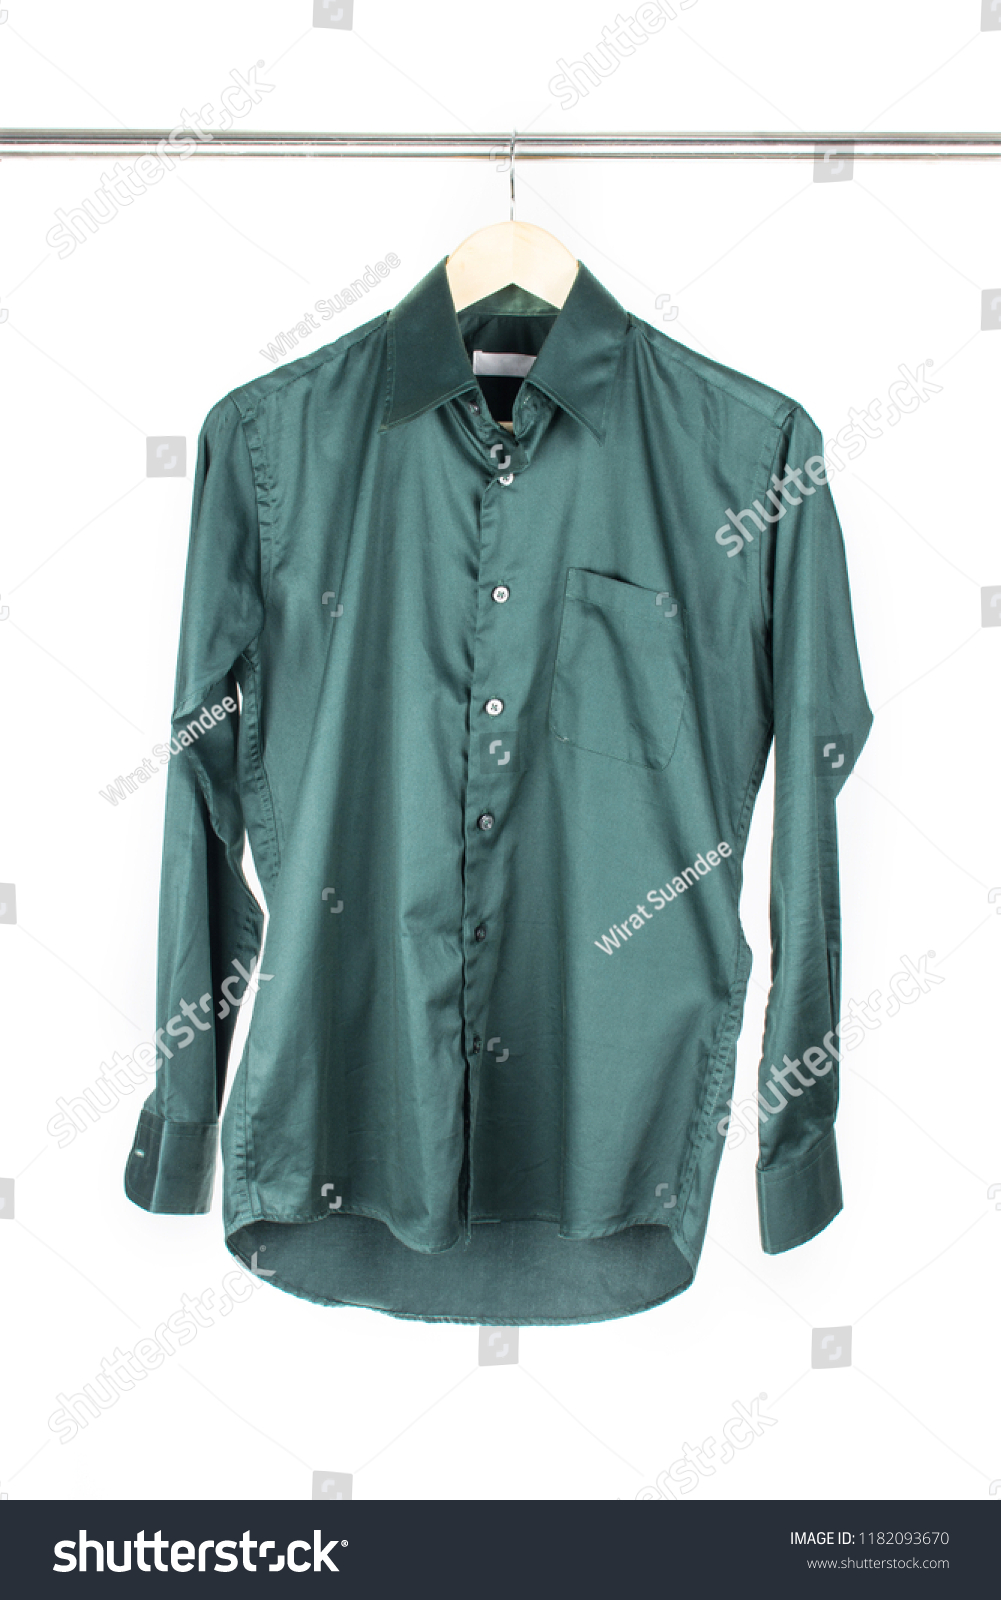 391383201 Custom Company Shirts Fast - Free Shipping. No Minimum.